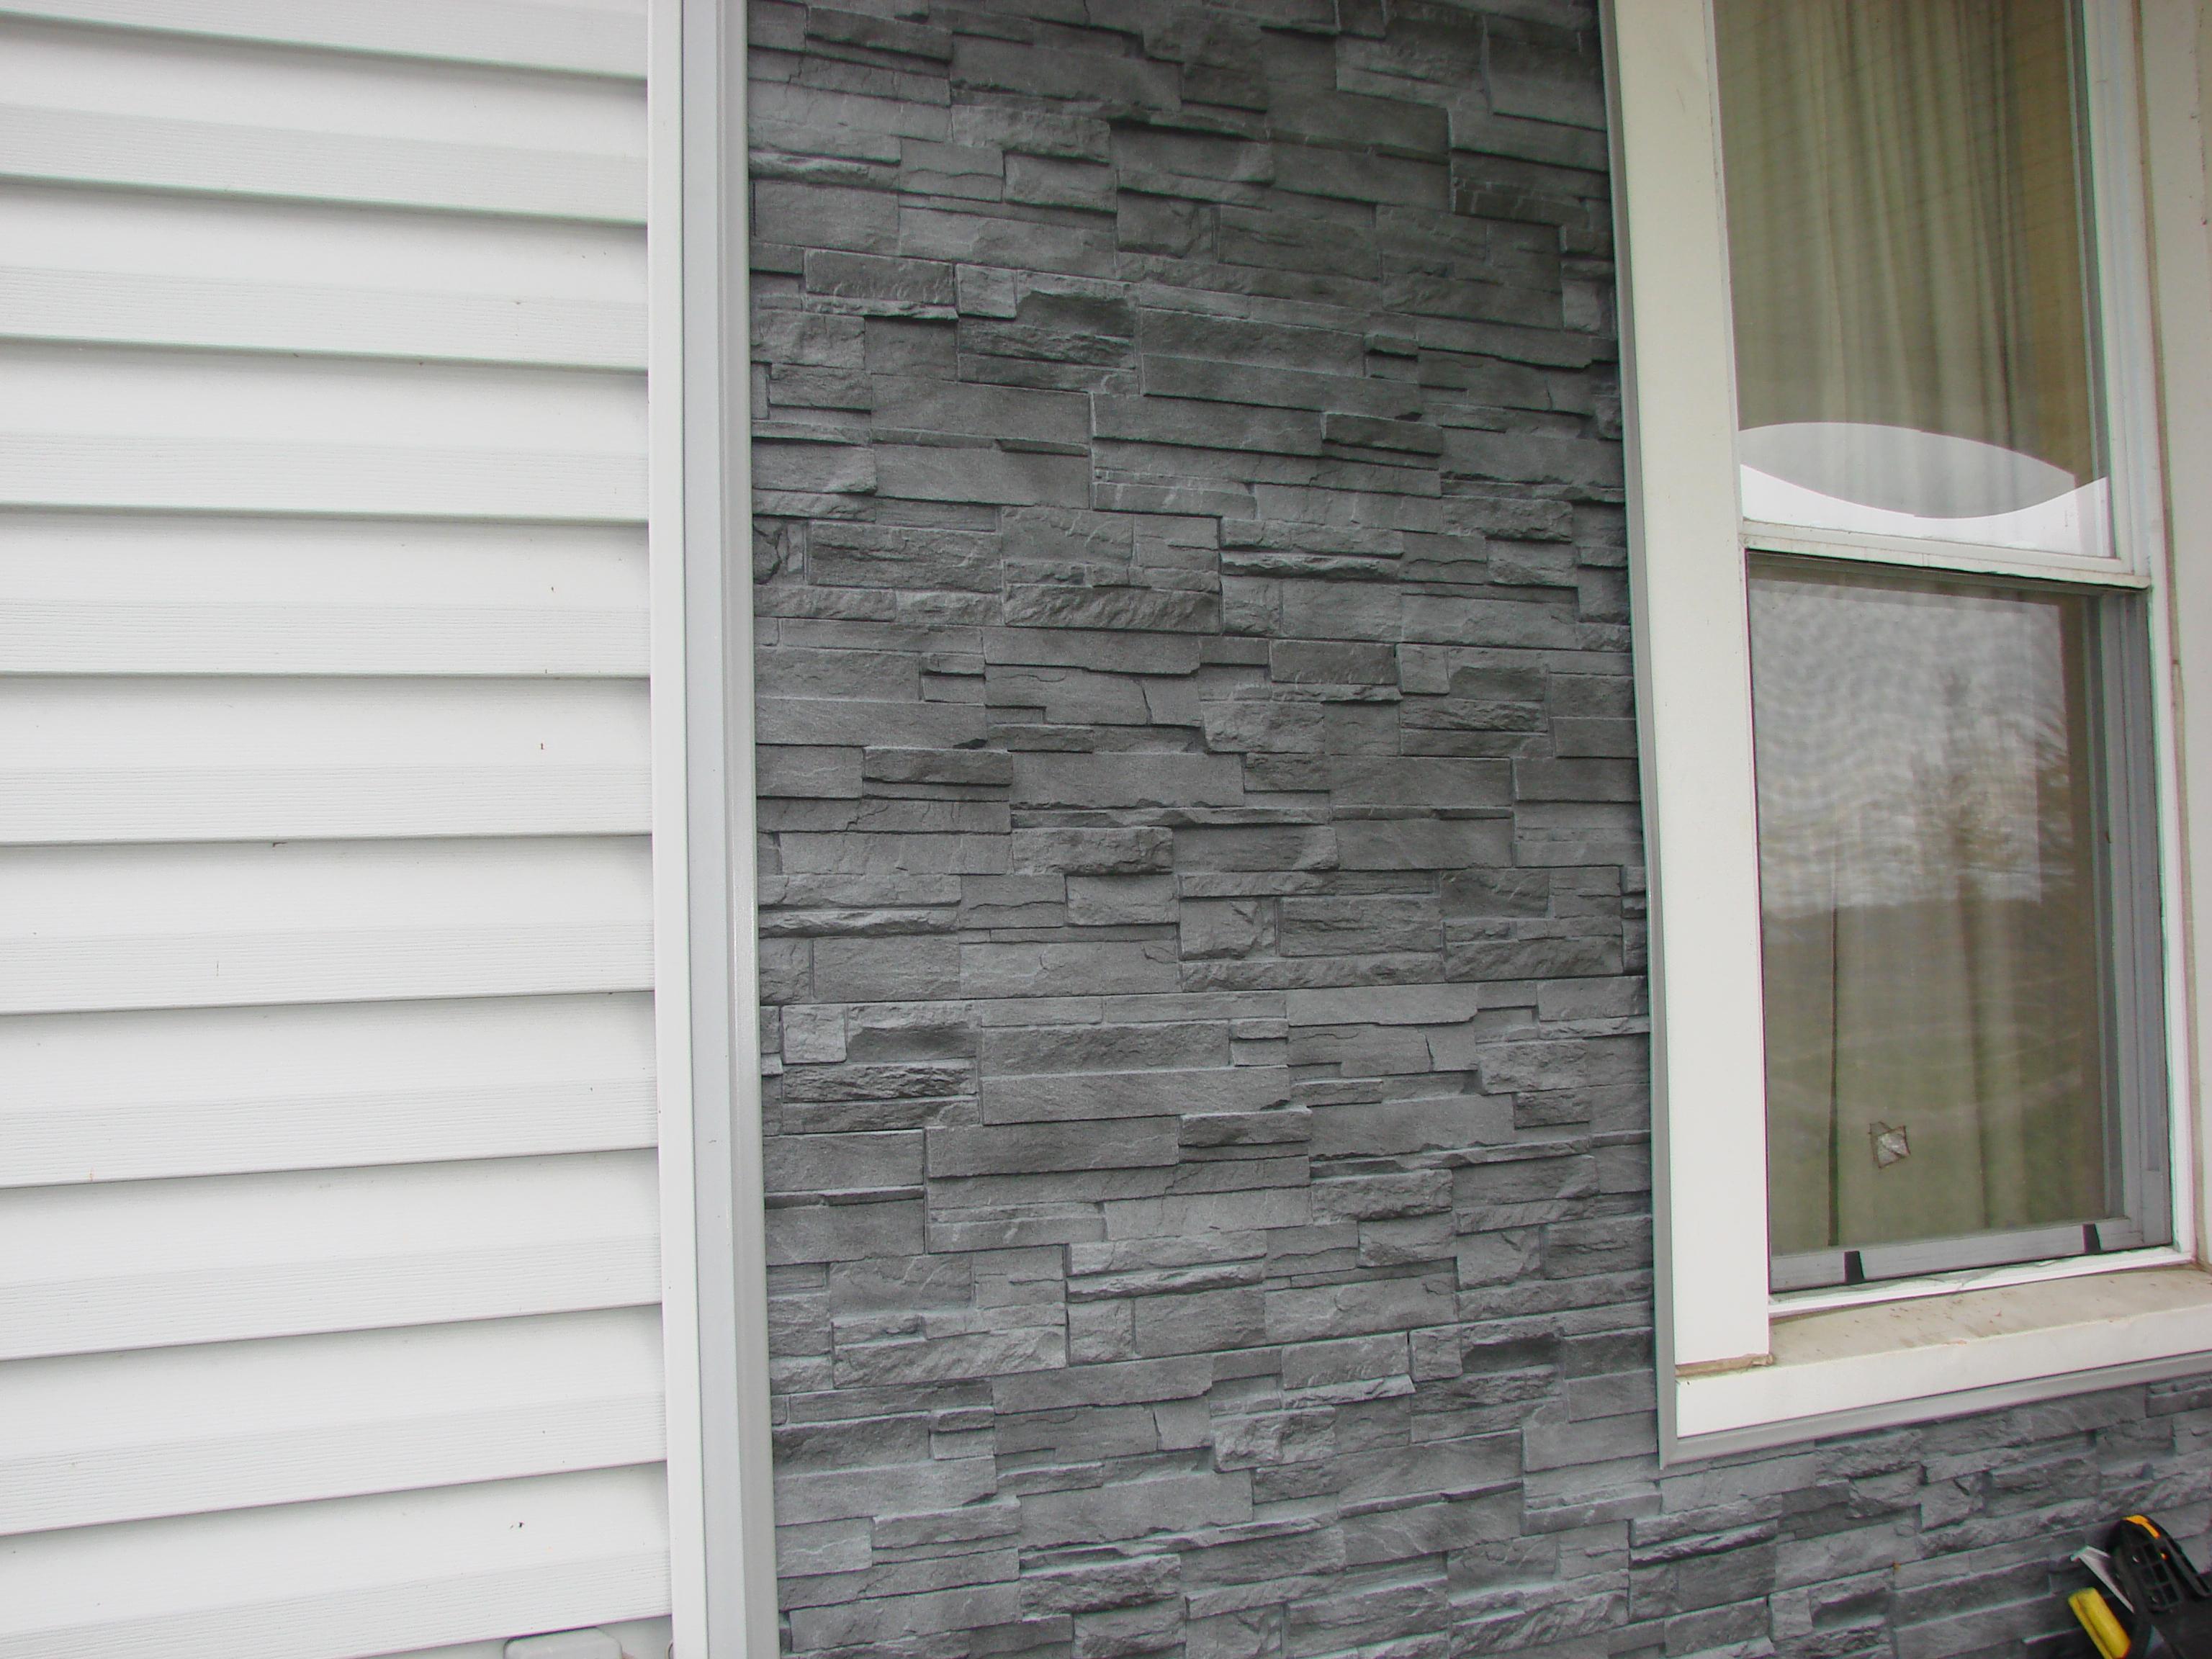 Dry Stack Stone Siding (Vinyl) u2013 Sherwood, Ohio : JeremyKrill.com